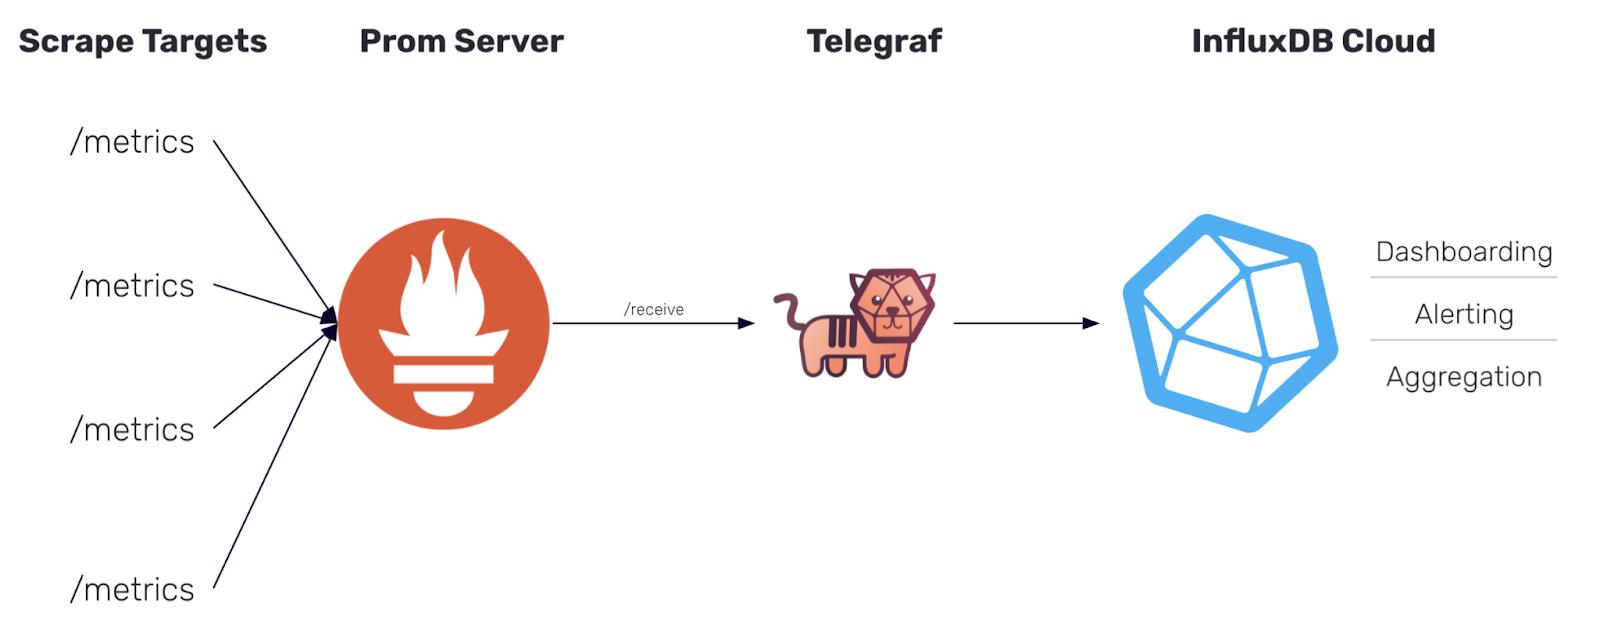 Data flow of Prometheus remote write metrics from Prometheus server into InfluxDB Cloud via Telegraf